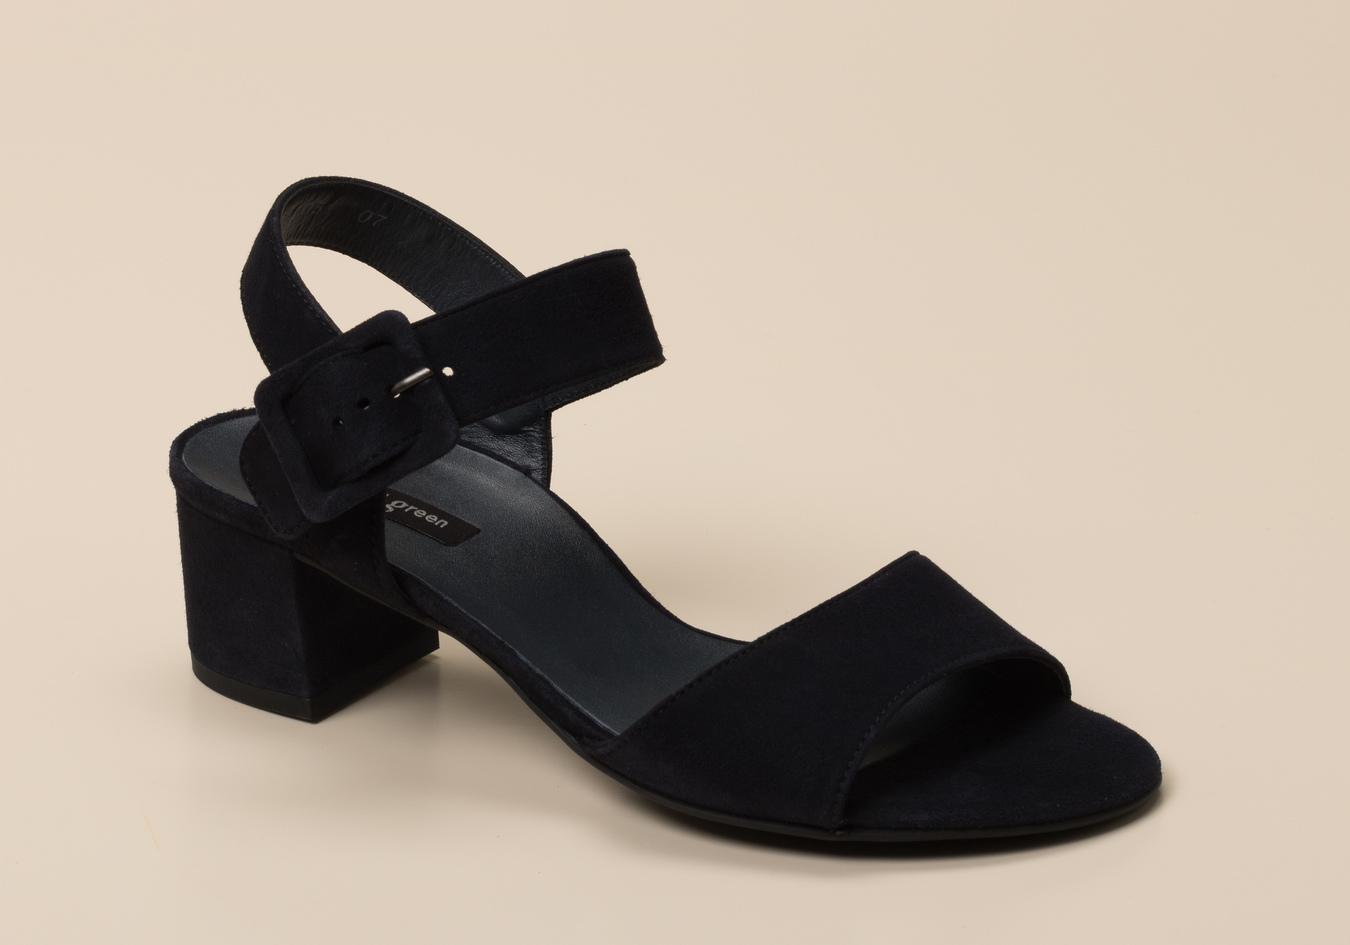 damen sandaletten festlich dunkelblau